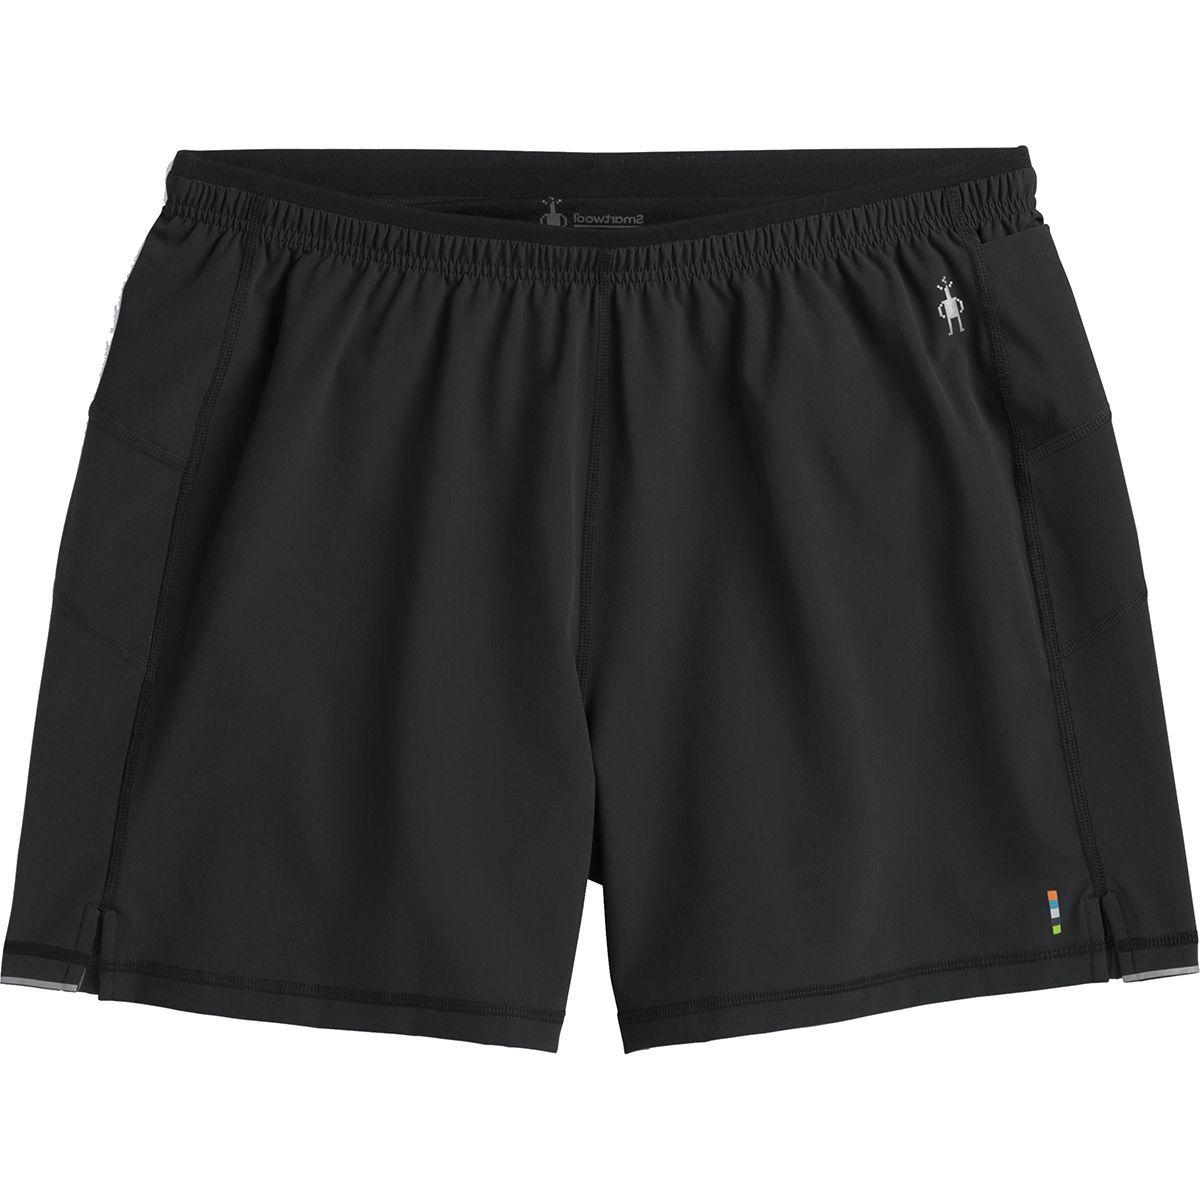 Smartwool Merino Sport Lined 5in Short - Men's